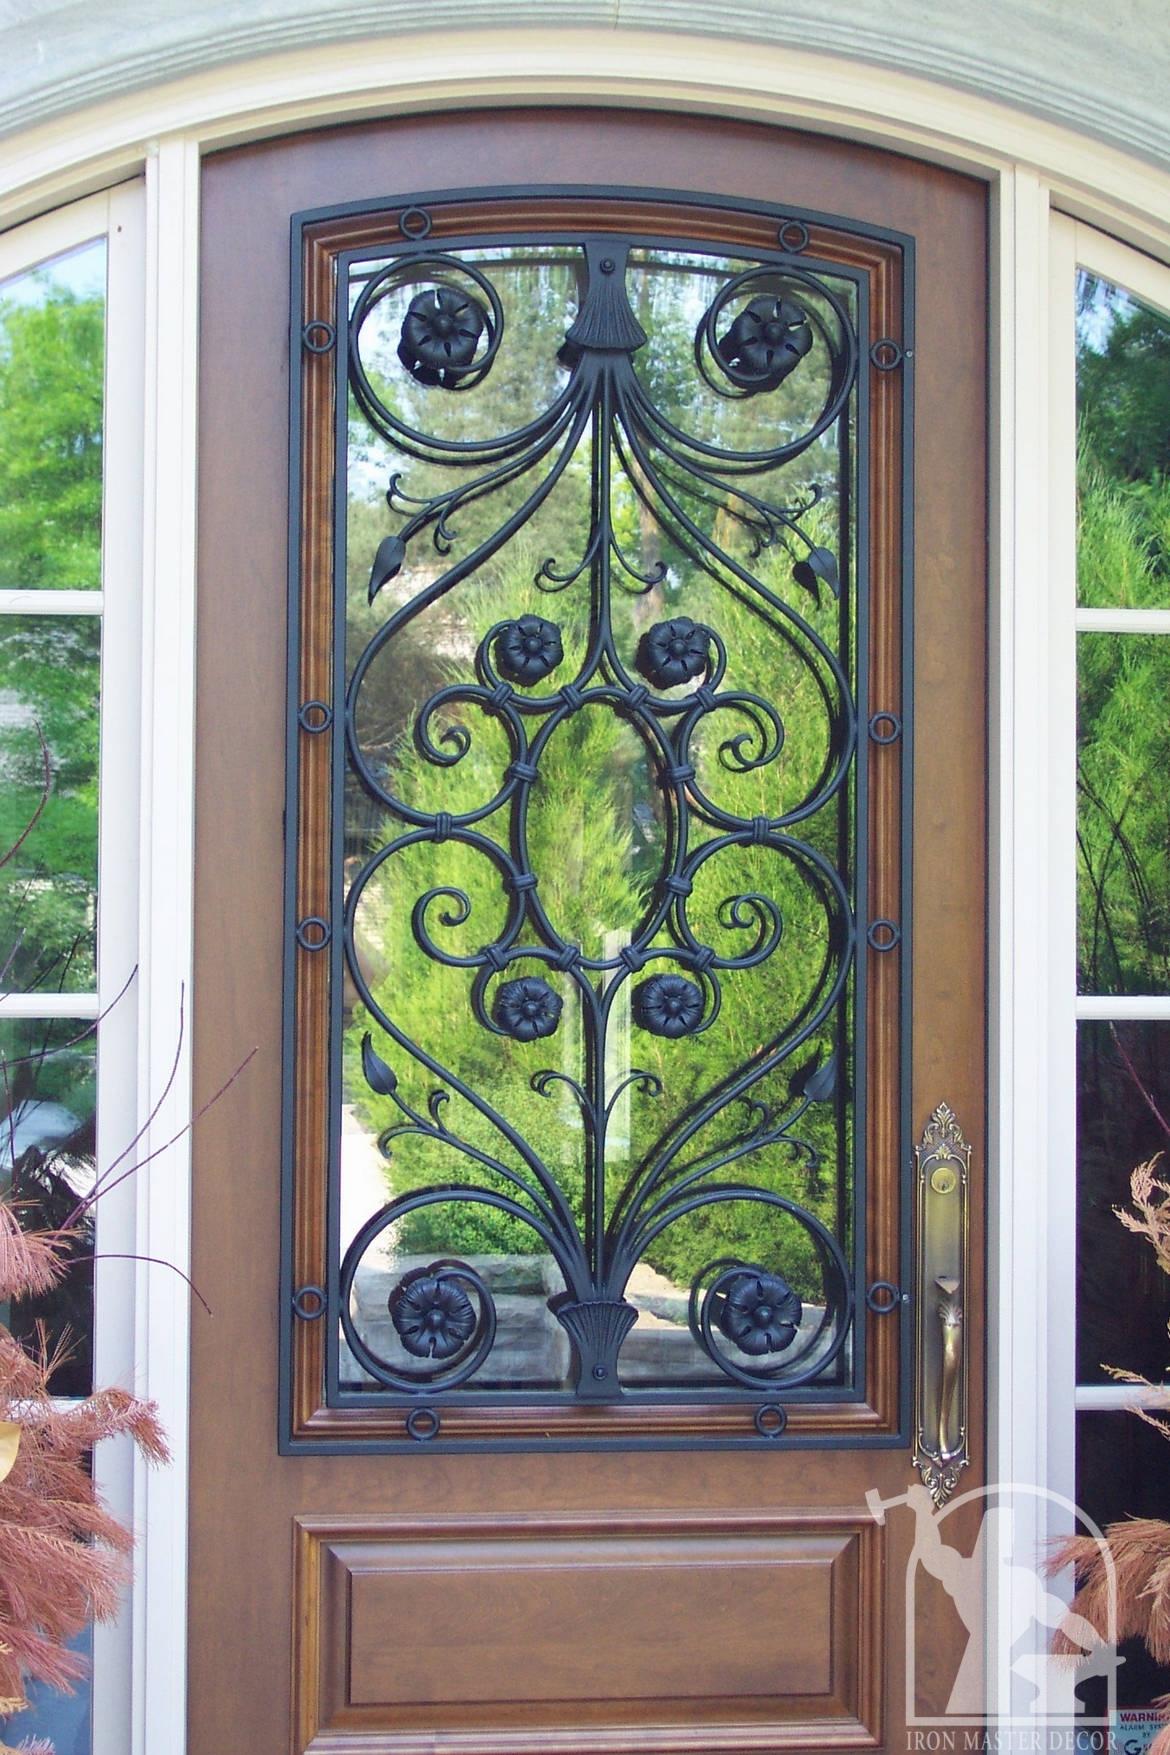 1755 #668942 Interior Railings Exterior Railings Front Doors Fences Gates  picture/photo Rod Iron Front Doors 43091170